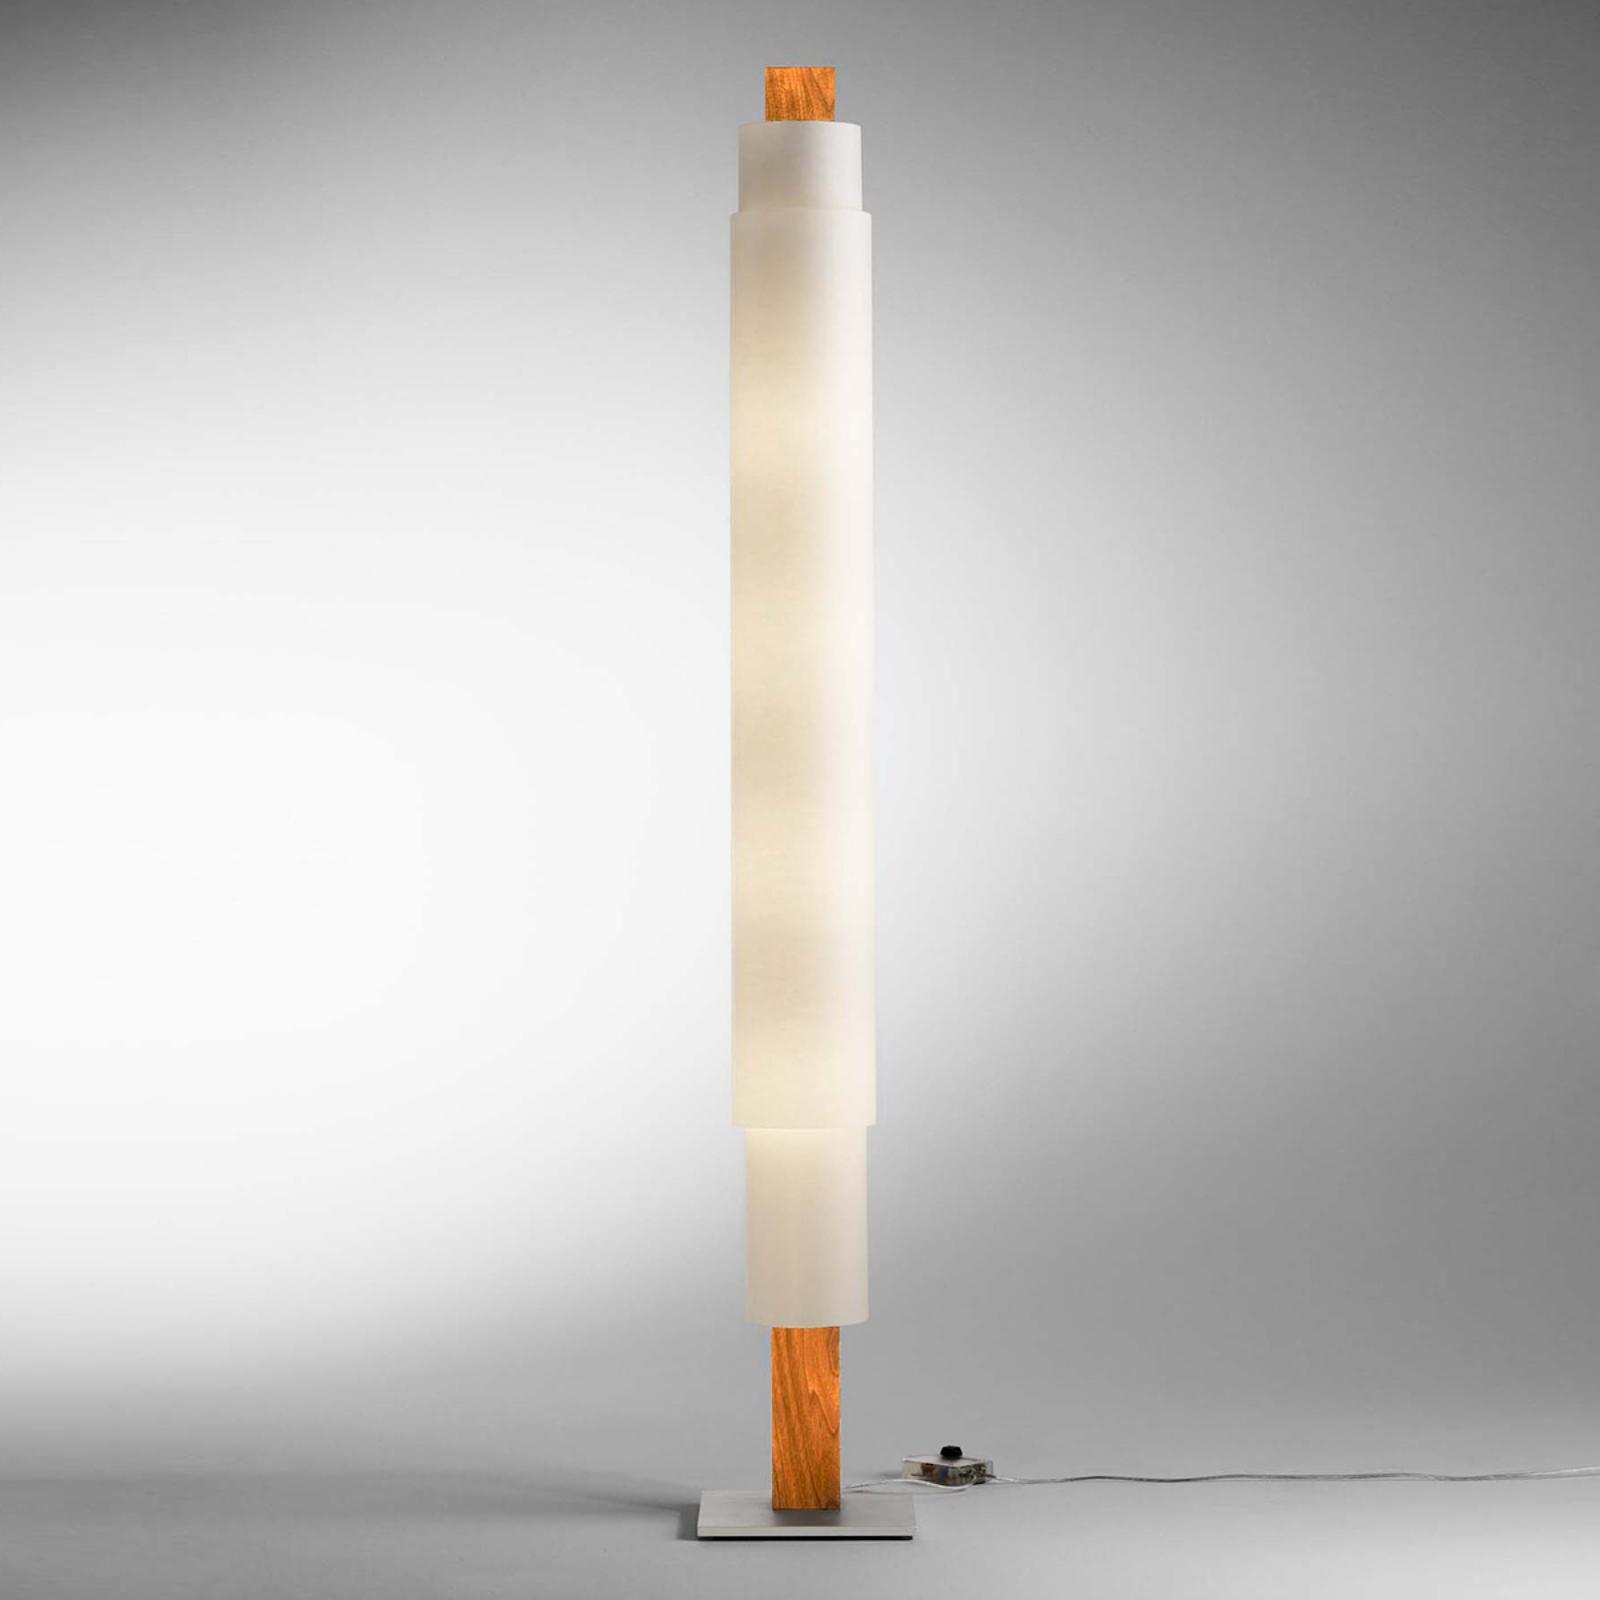 Lampada LED da pavimento Stele in faggio